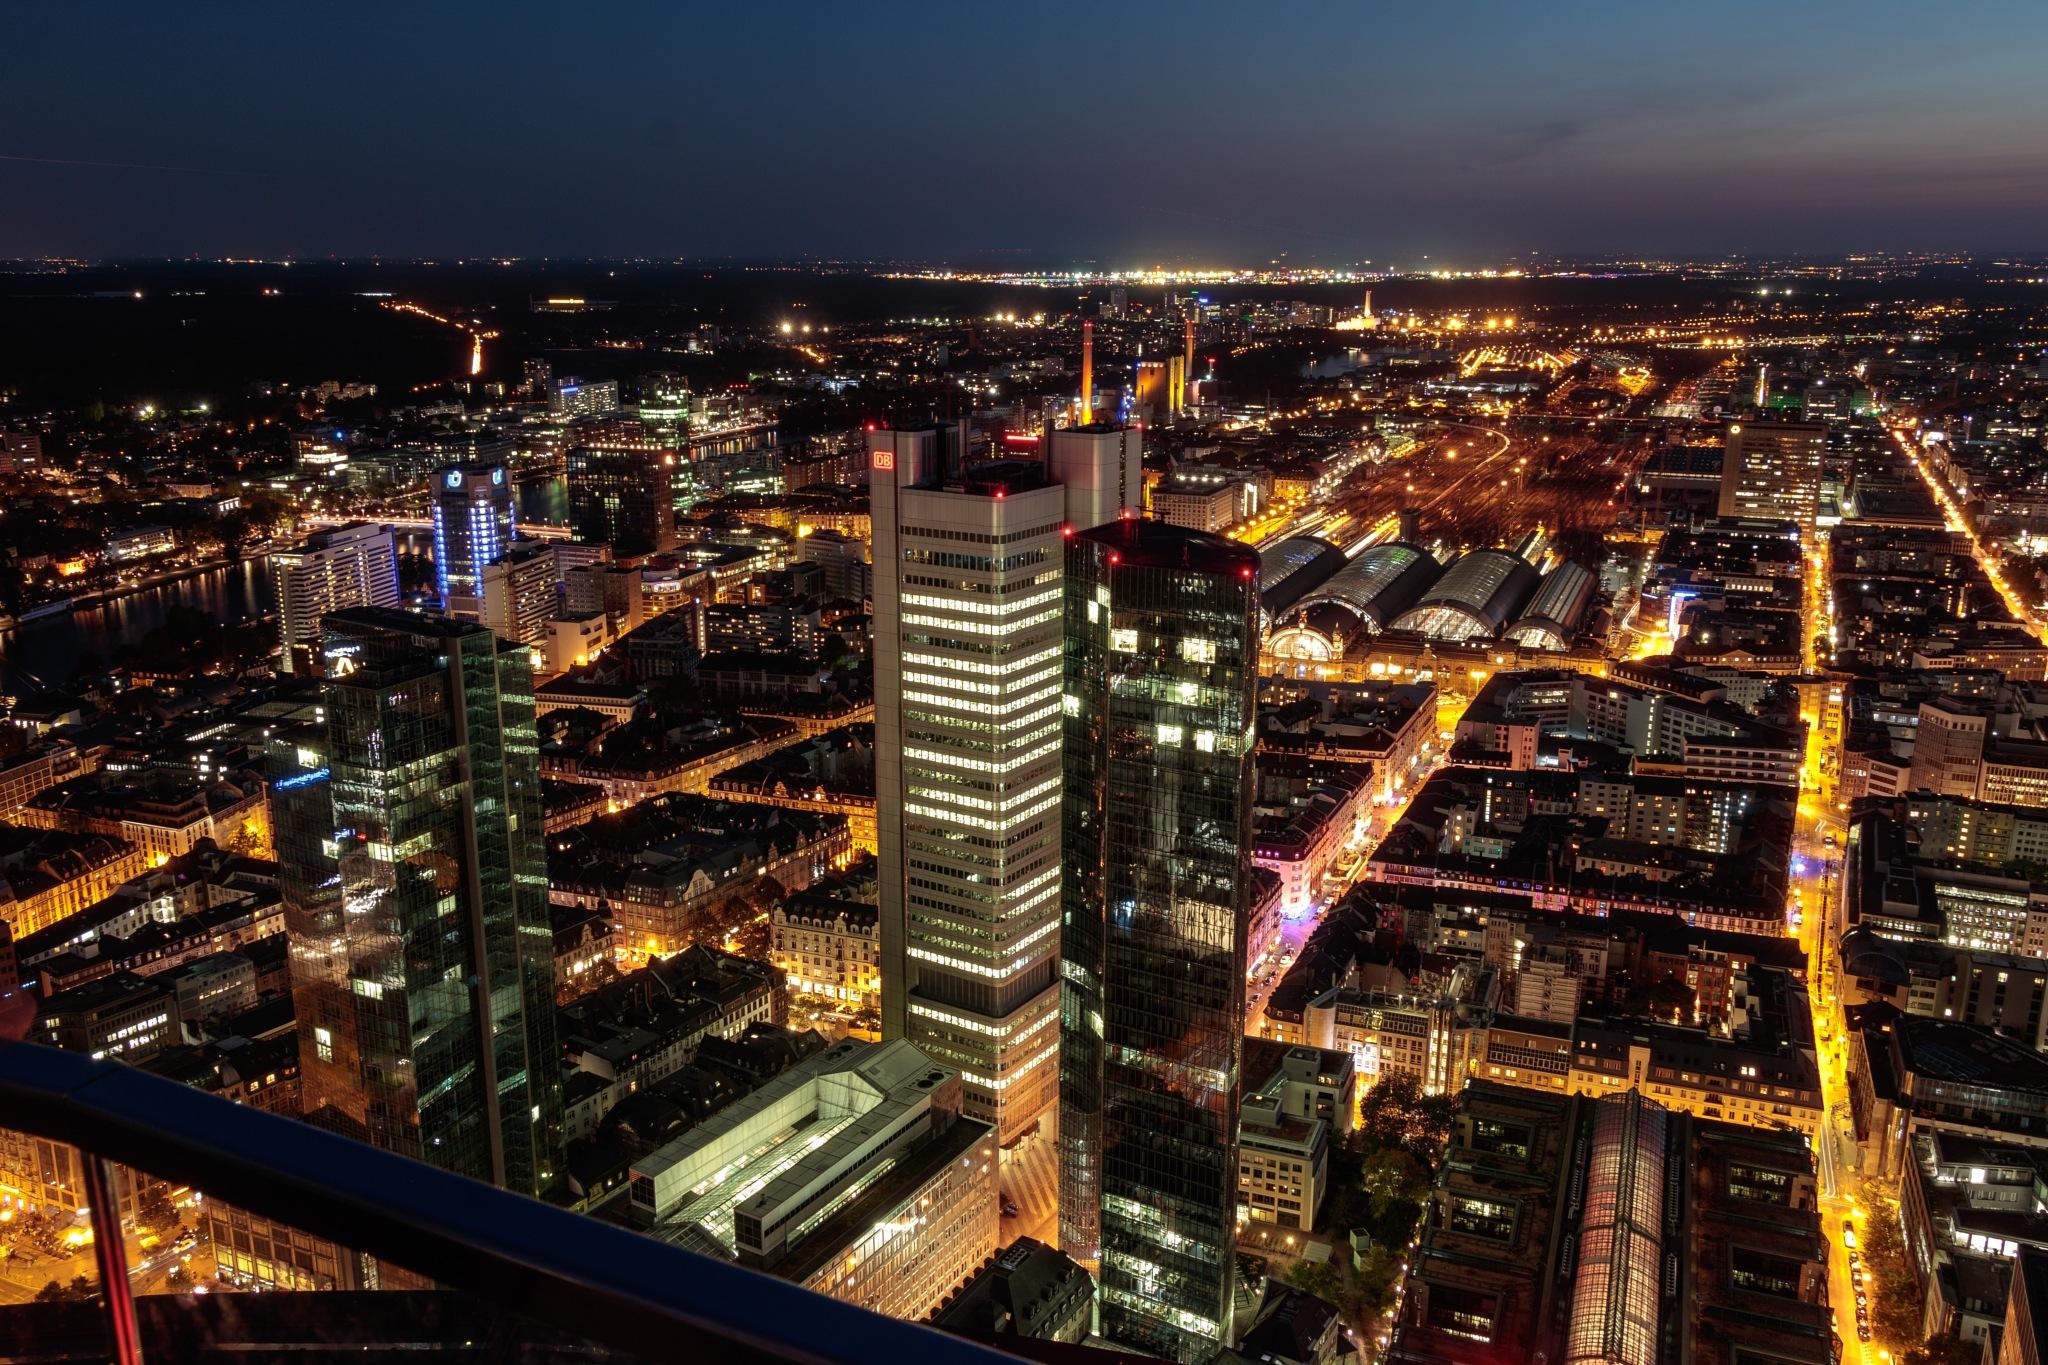 Frankfurt City at night by Dirk Selzer